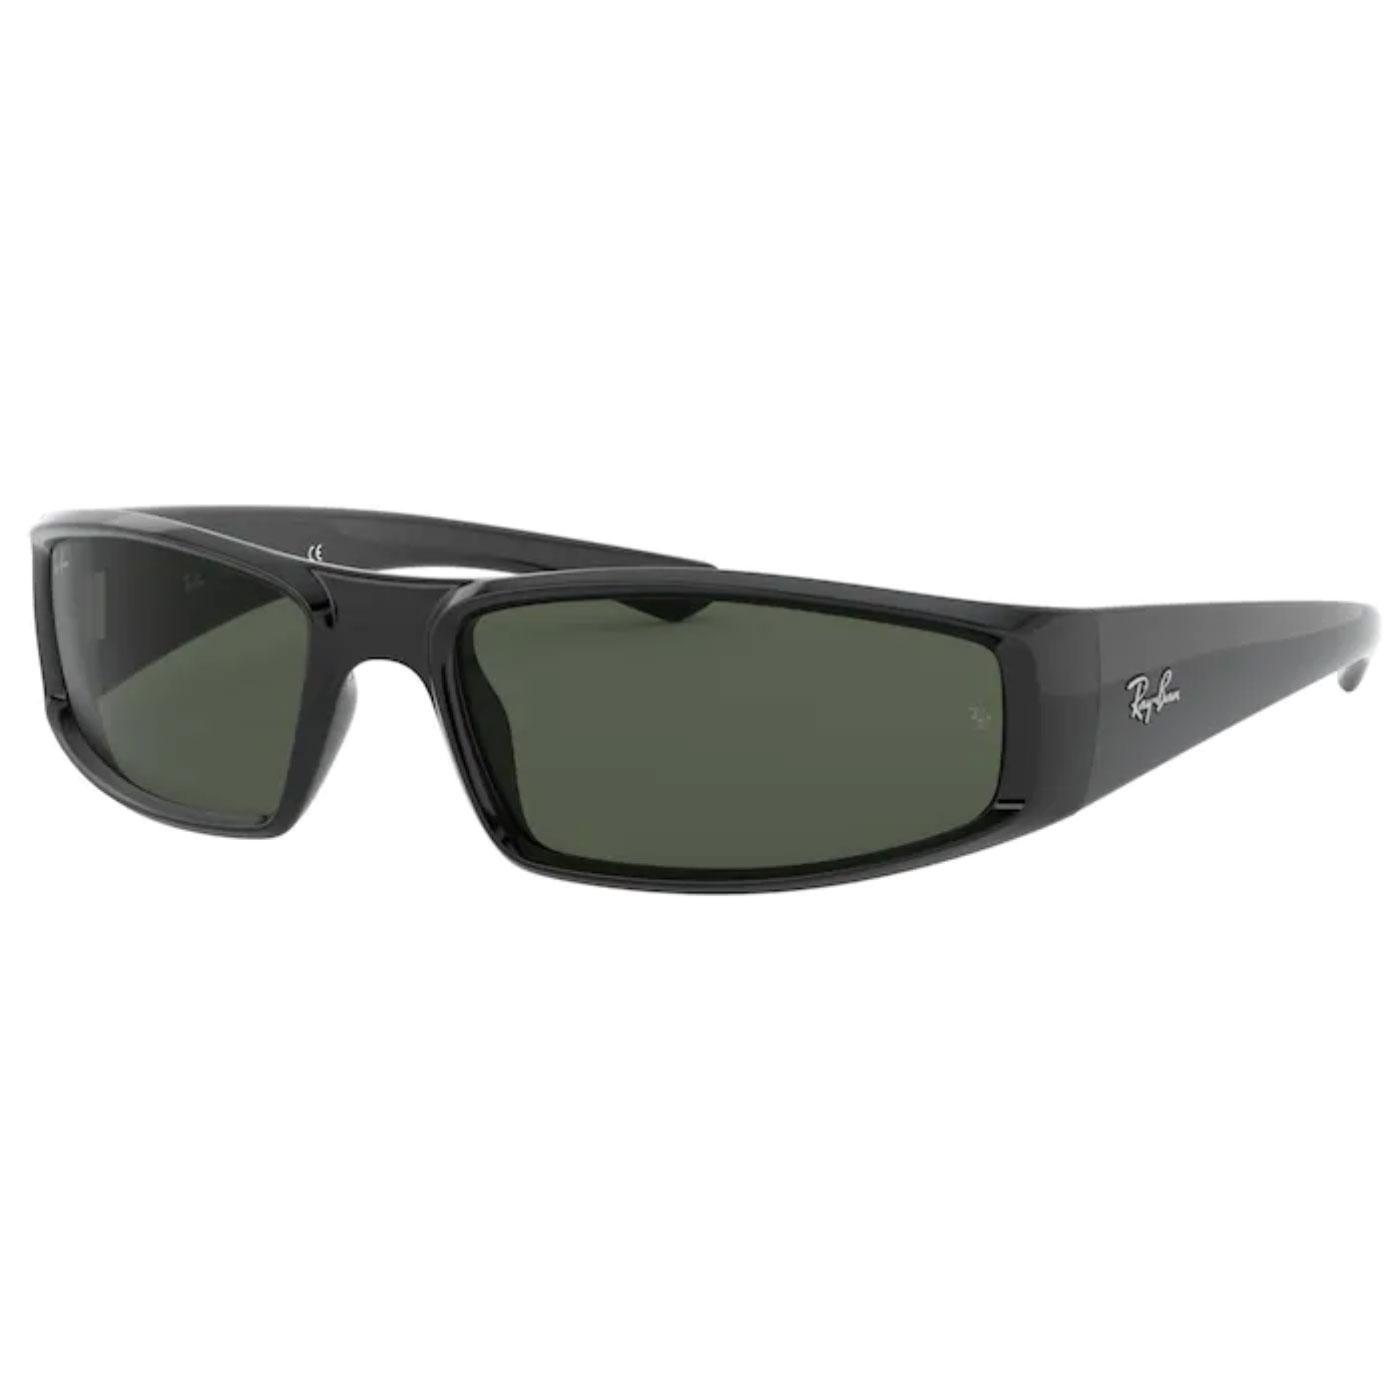 RAY-BAN RB4335 Retro Wrap Round Sunglasses BLACK